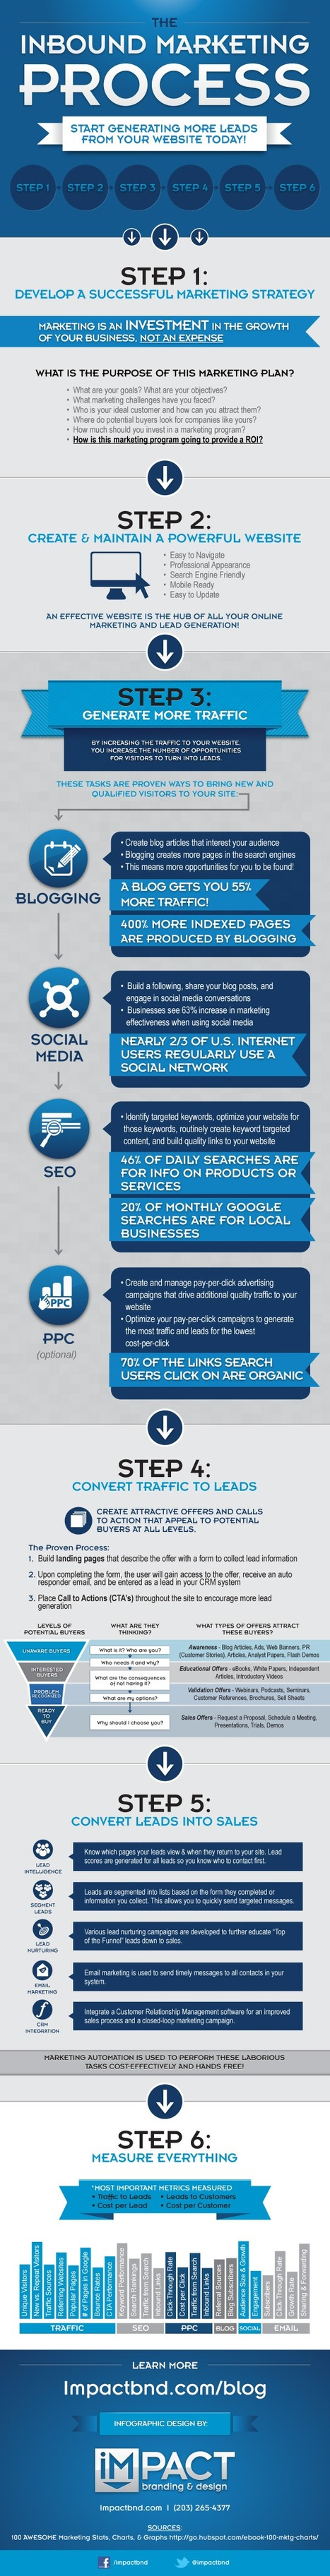 impactbnd-inbound-marketing-process-final-resized-600.jpg.png (600x4688 pixels) | Online Marketing - News & How to's | Scoop.it